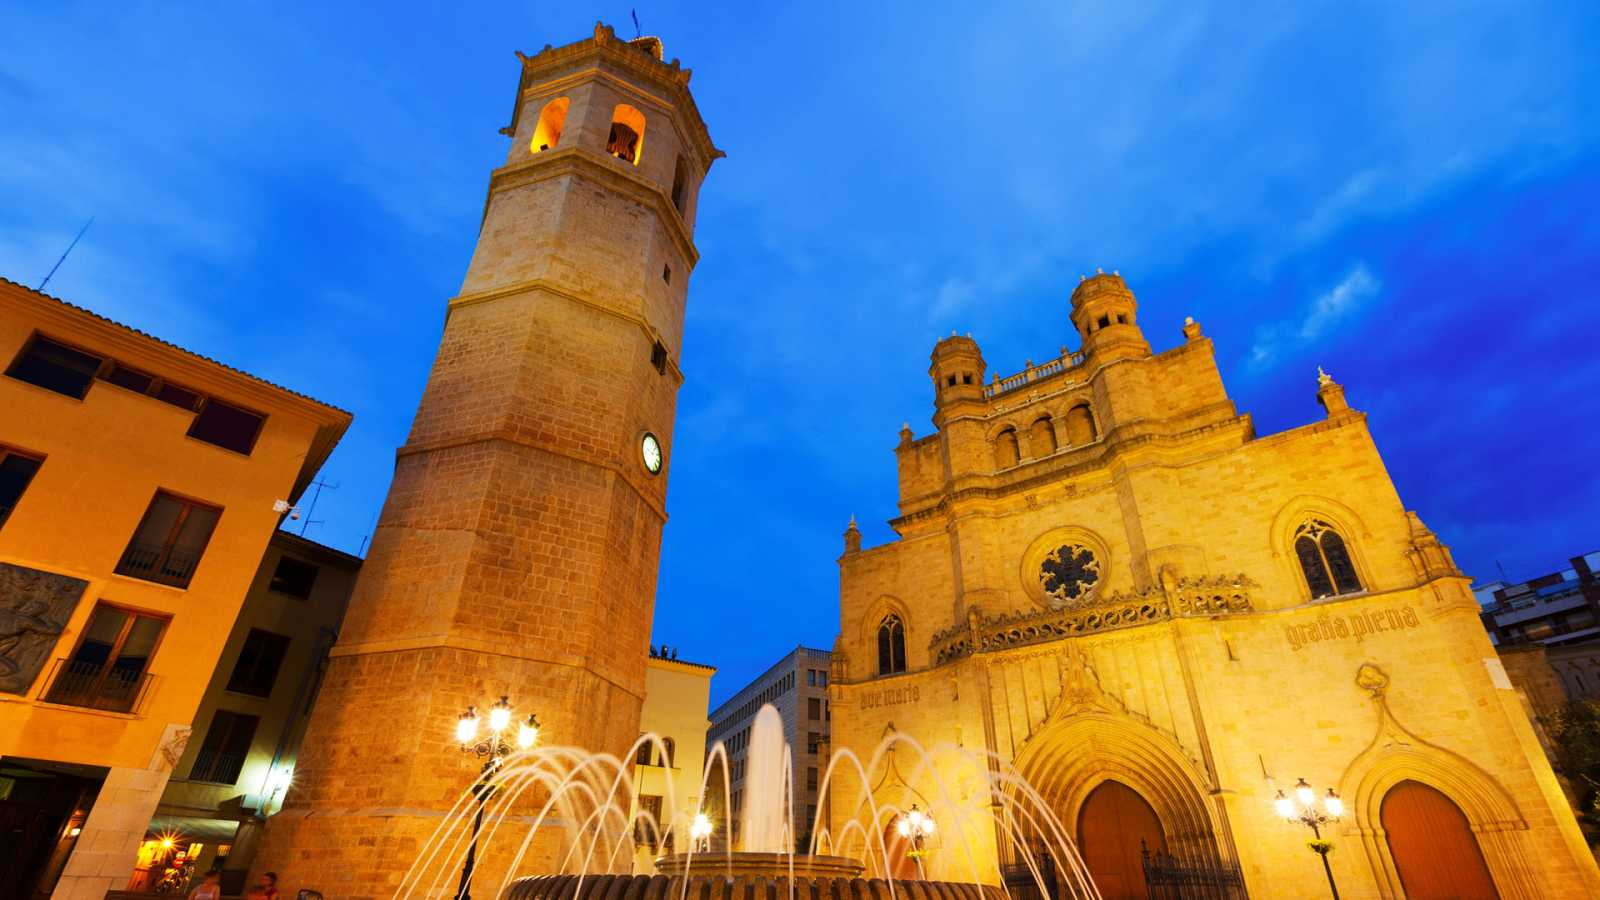 Un país mágico - Castellón - ver ahora